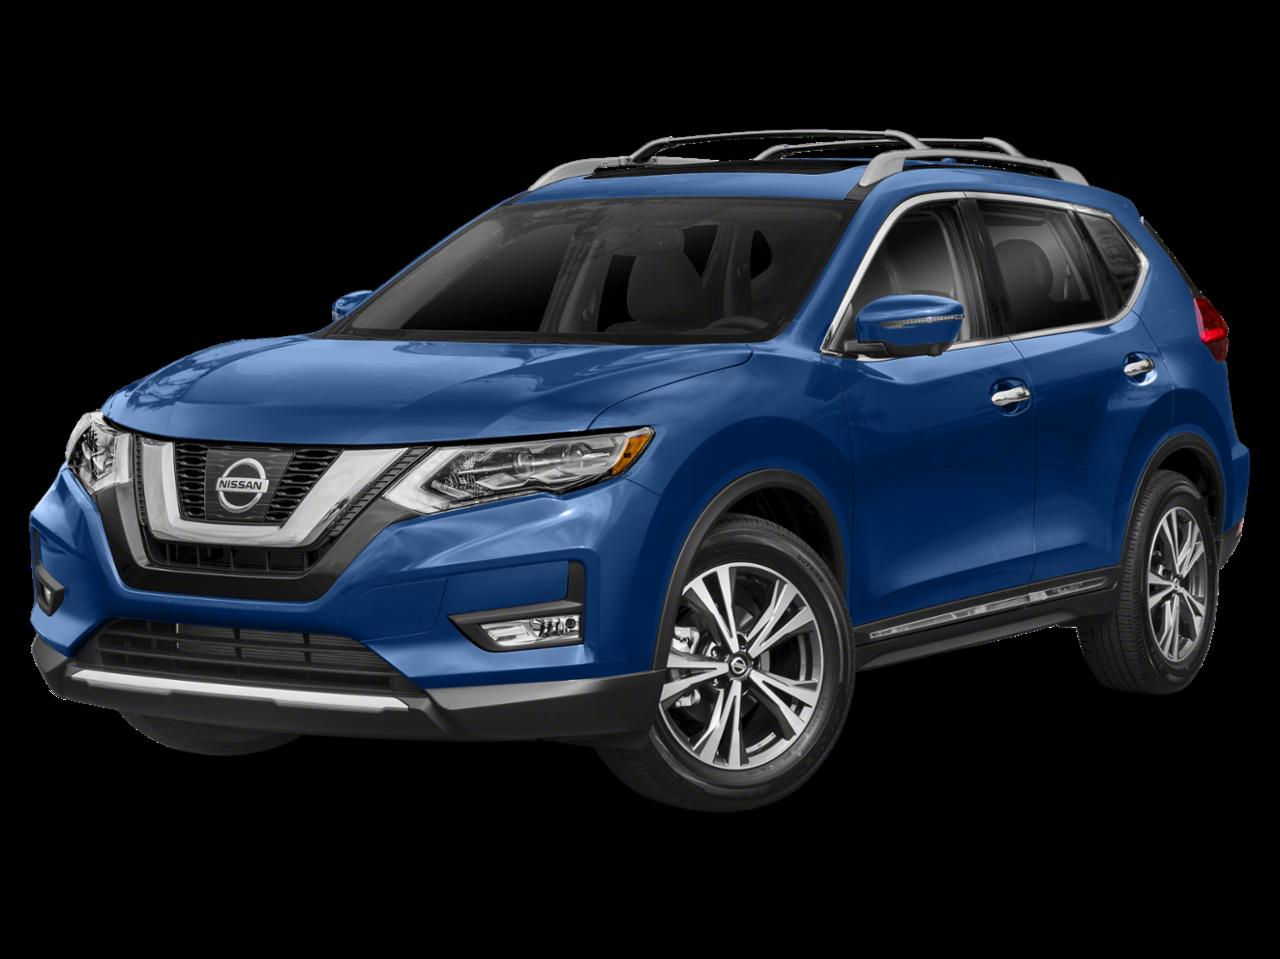 2019 Nissan Rogue SL FWD Sport Utility